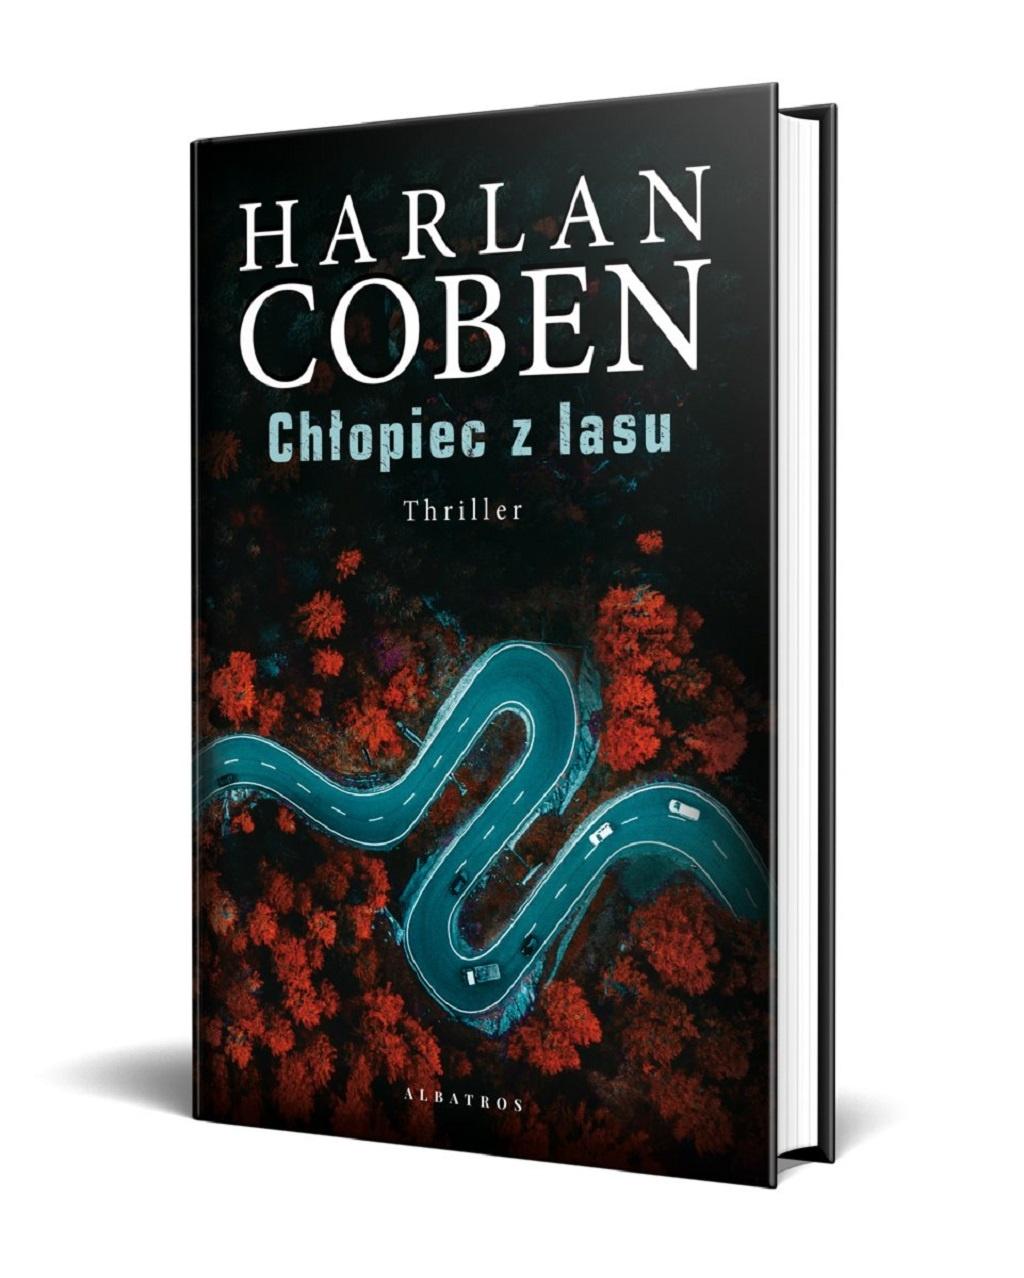 Harlan Coben – Chłopiec z lasu